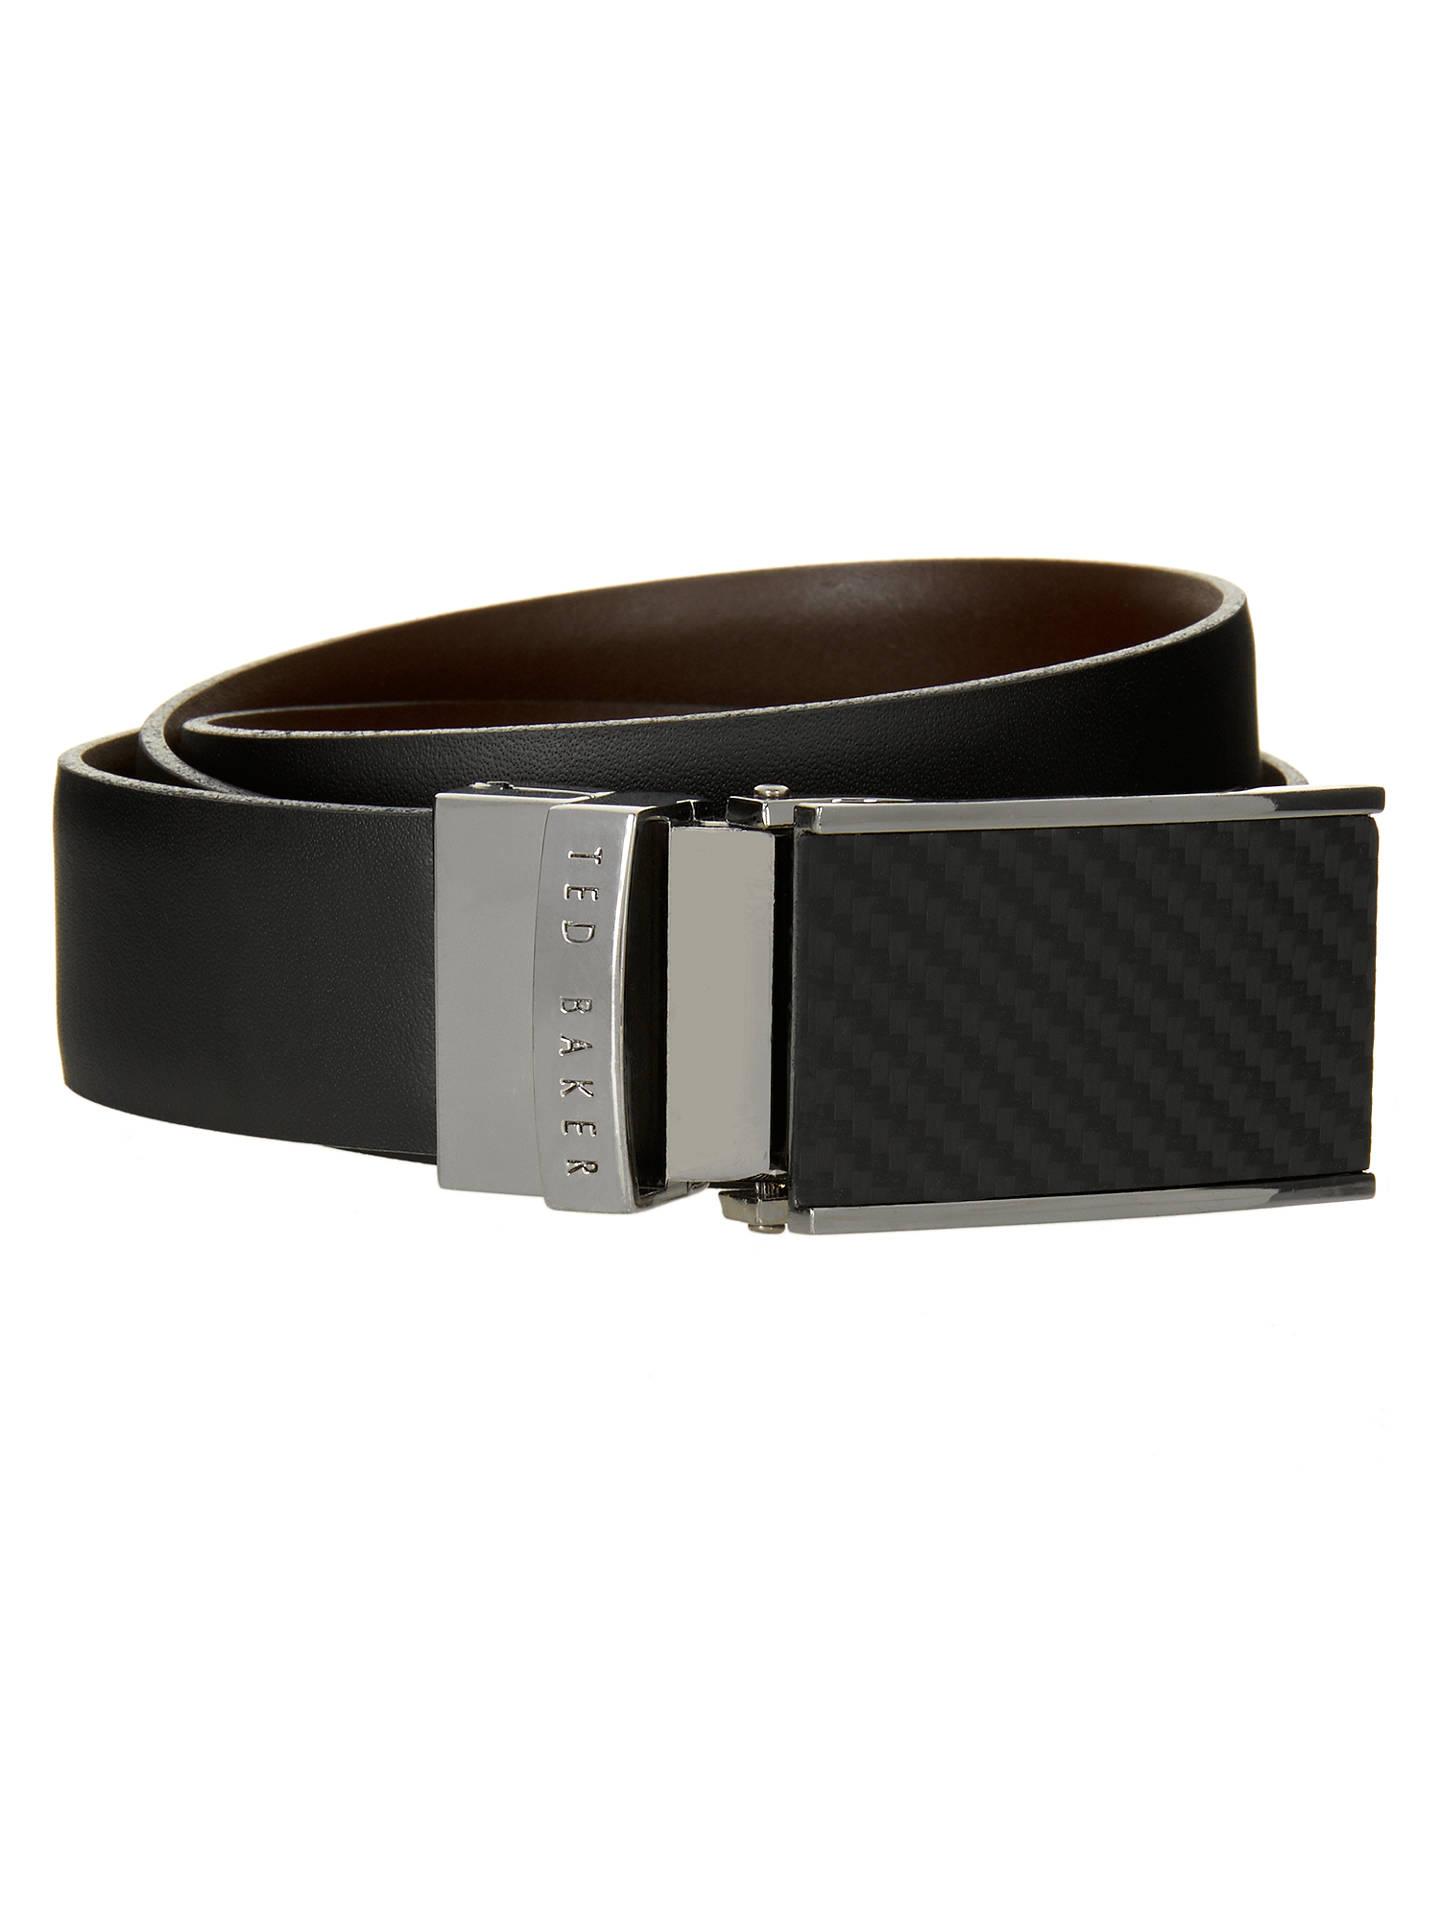 1ea57e5b657d Buy Ted Baker Twill Reversible Leather Belt